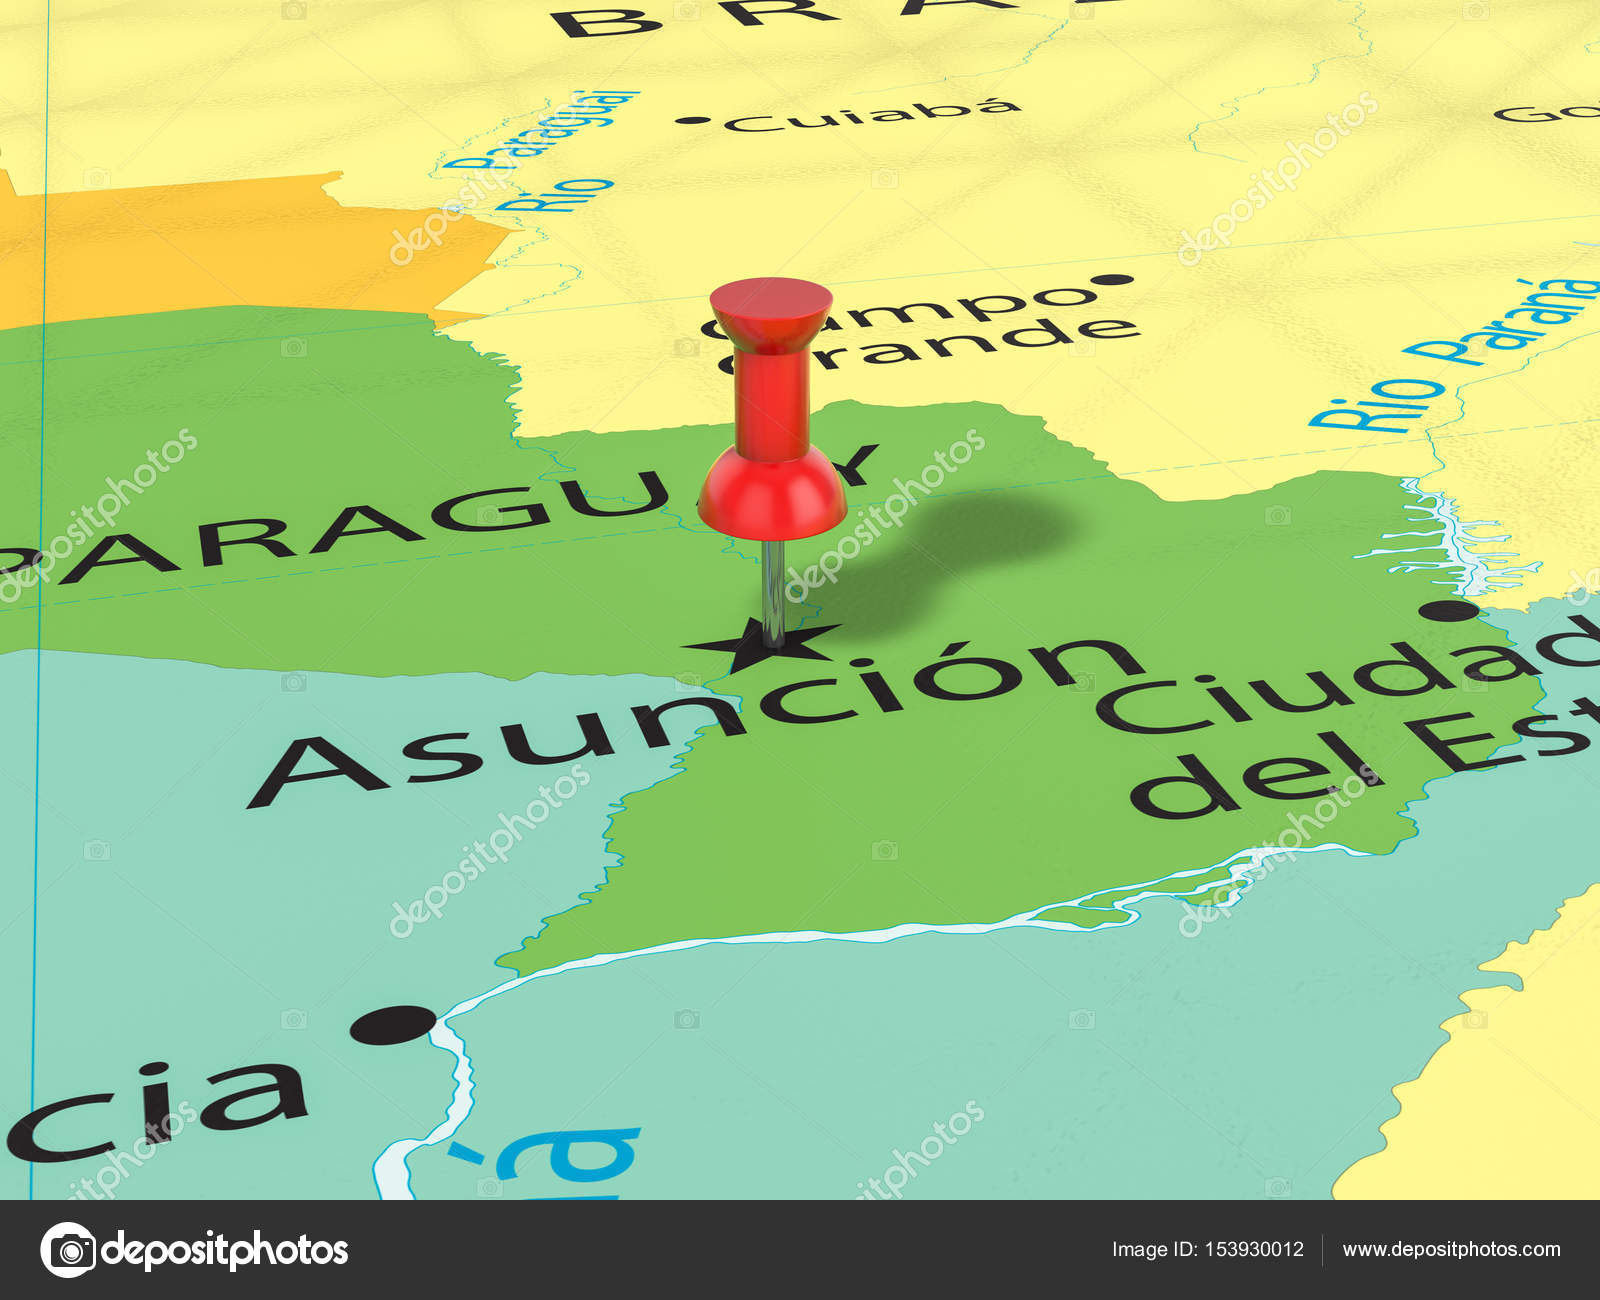 Pushpin on Asuncion map Stock Photo julydfg 153930012